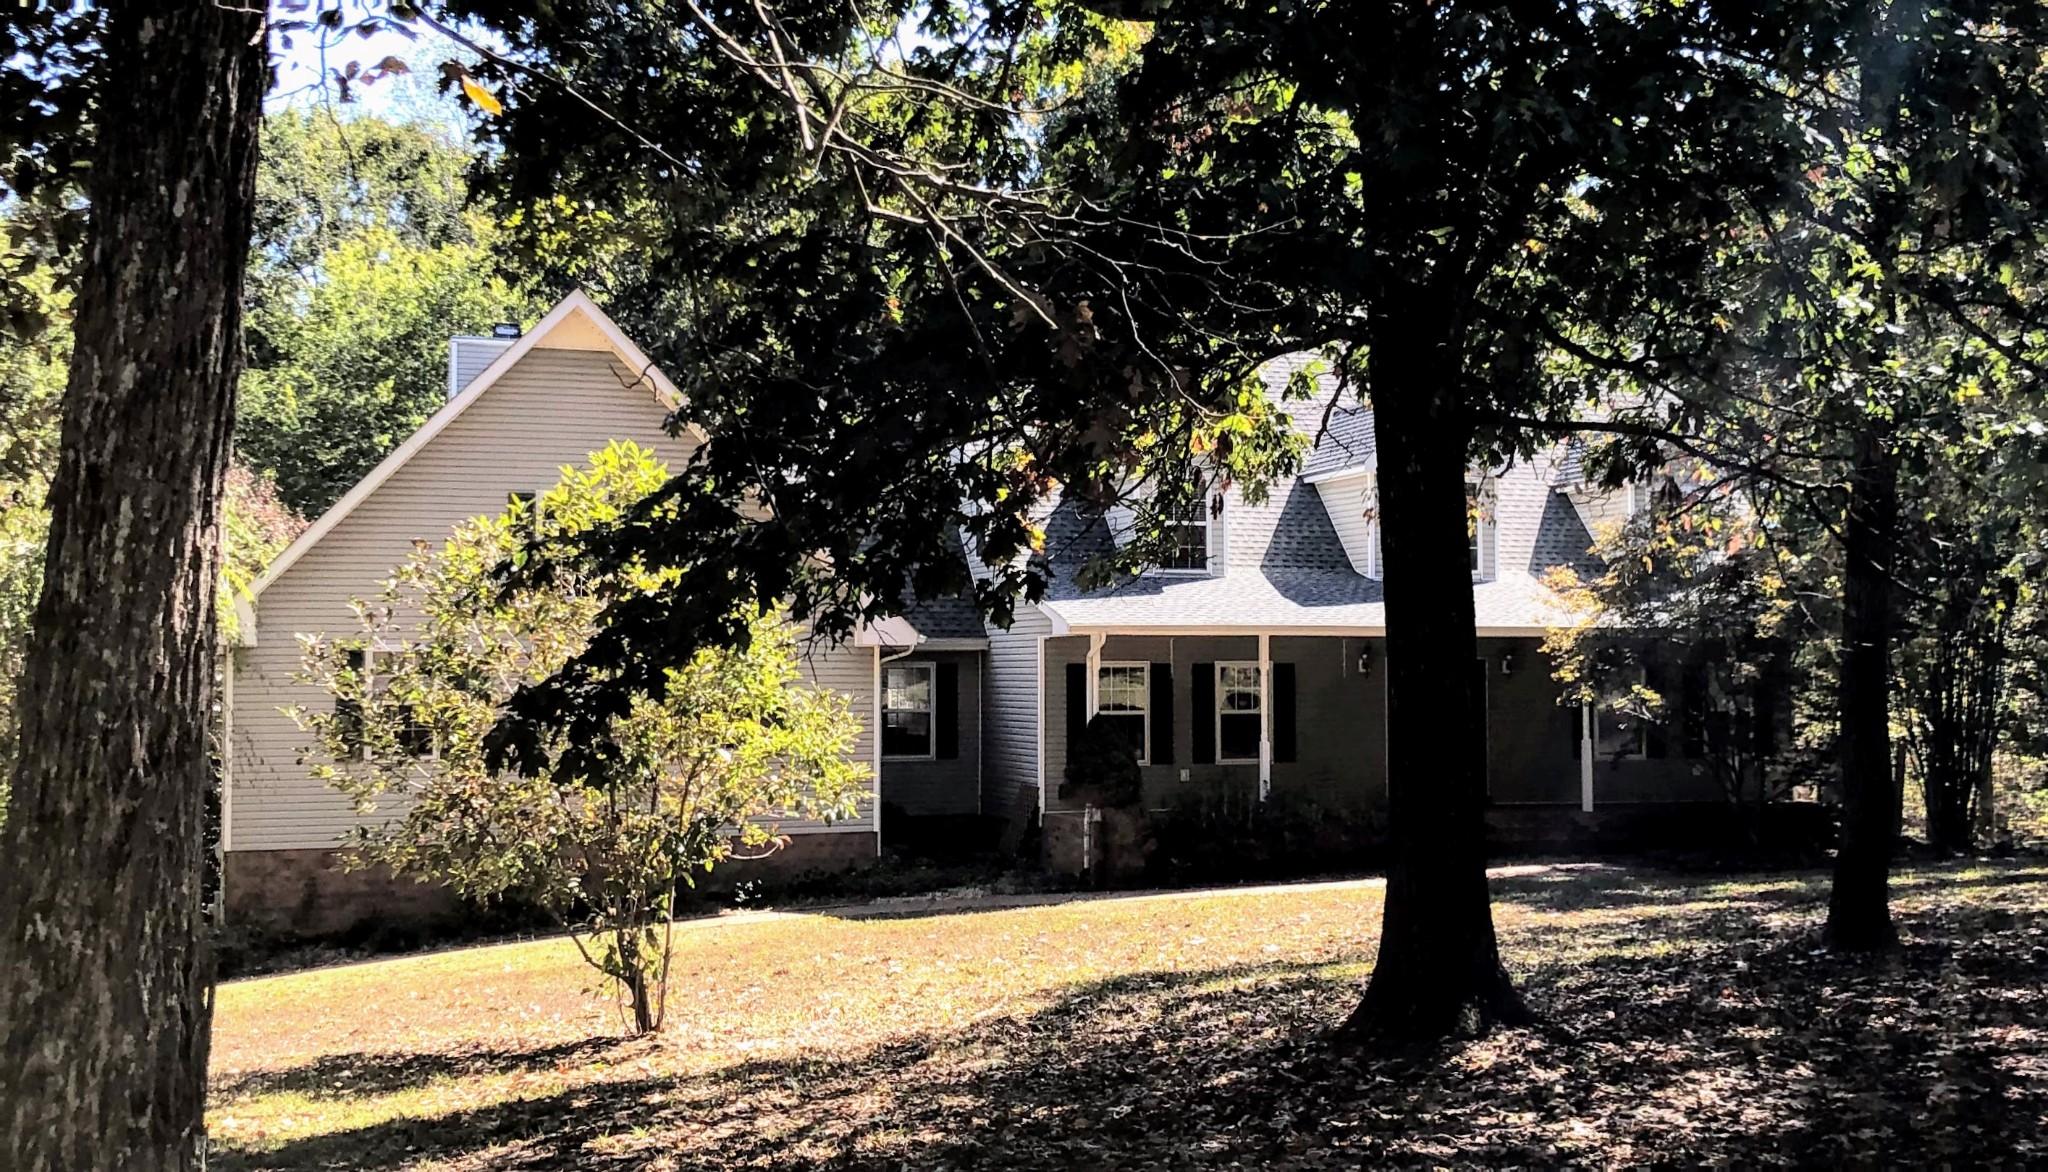 714 Iron Hill Rd, Burns, TN 37029 - Burns, TN real estate listing